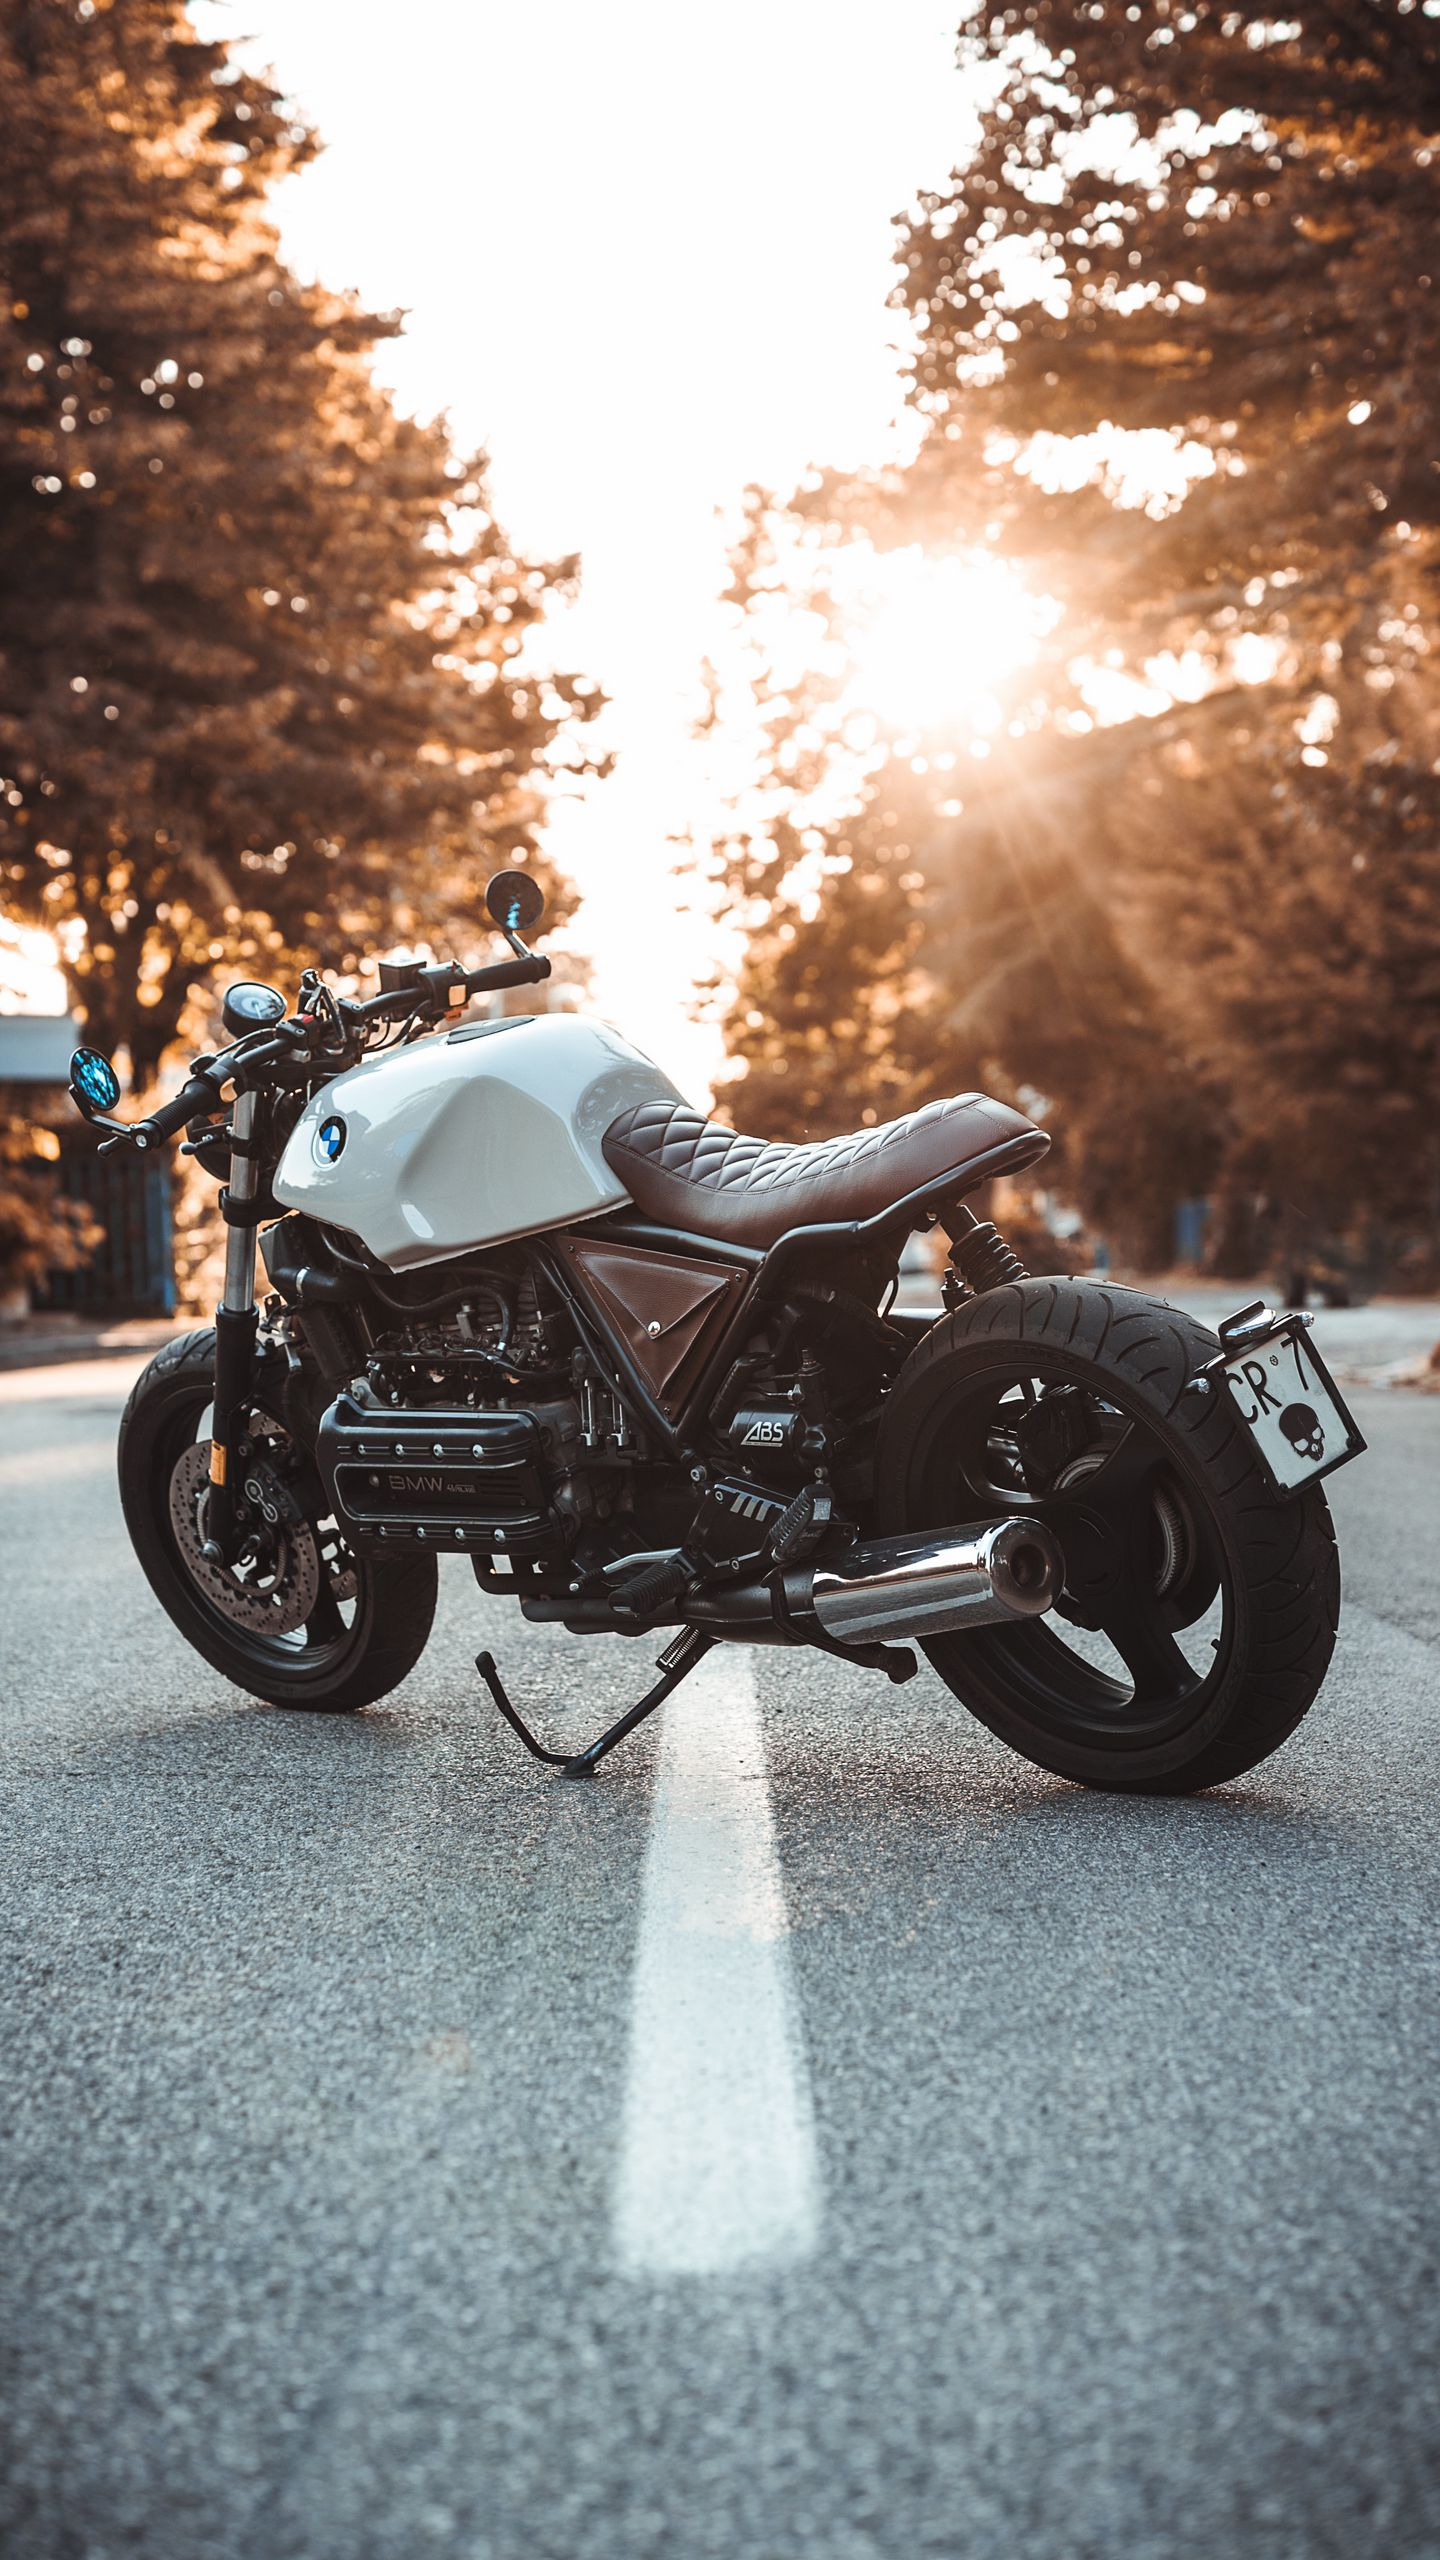 1440x2560 Обои bmw k100, мотоцикл, байк, вид сбоку